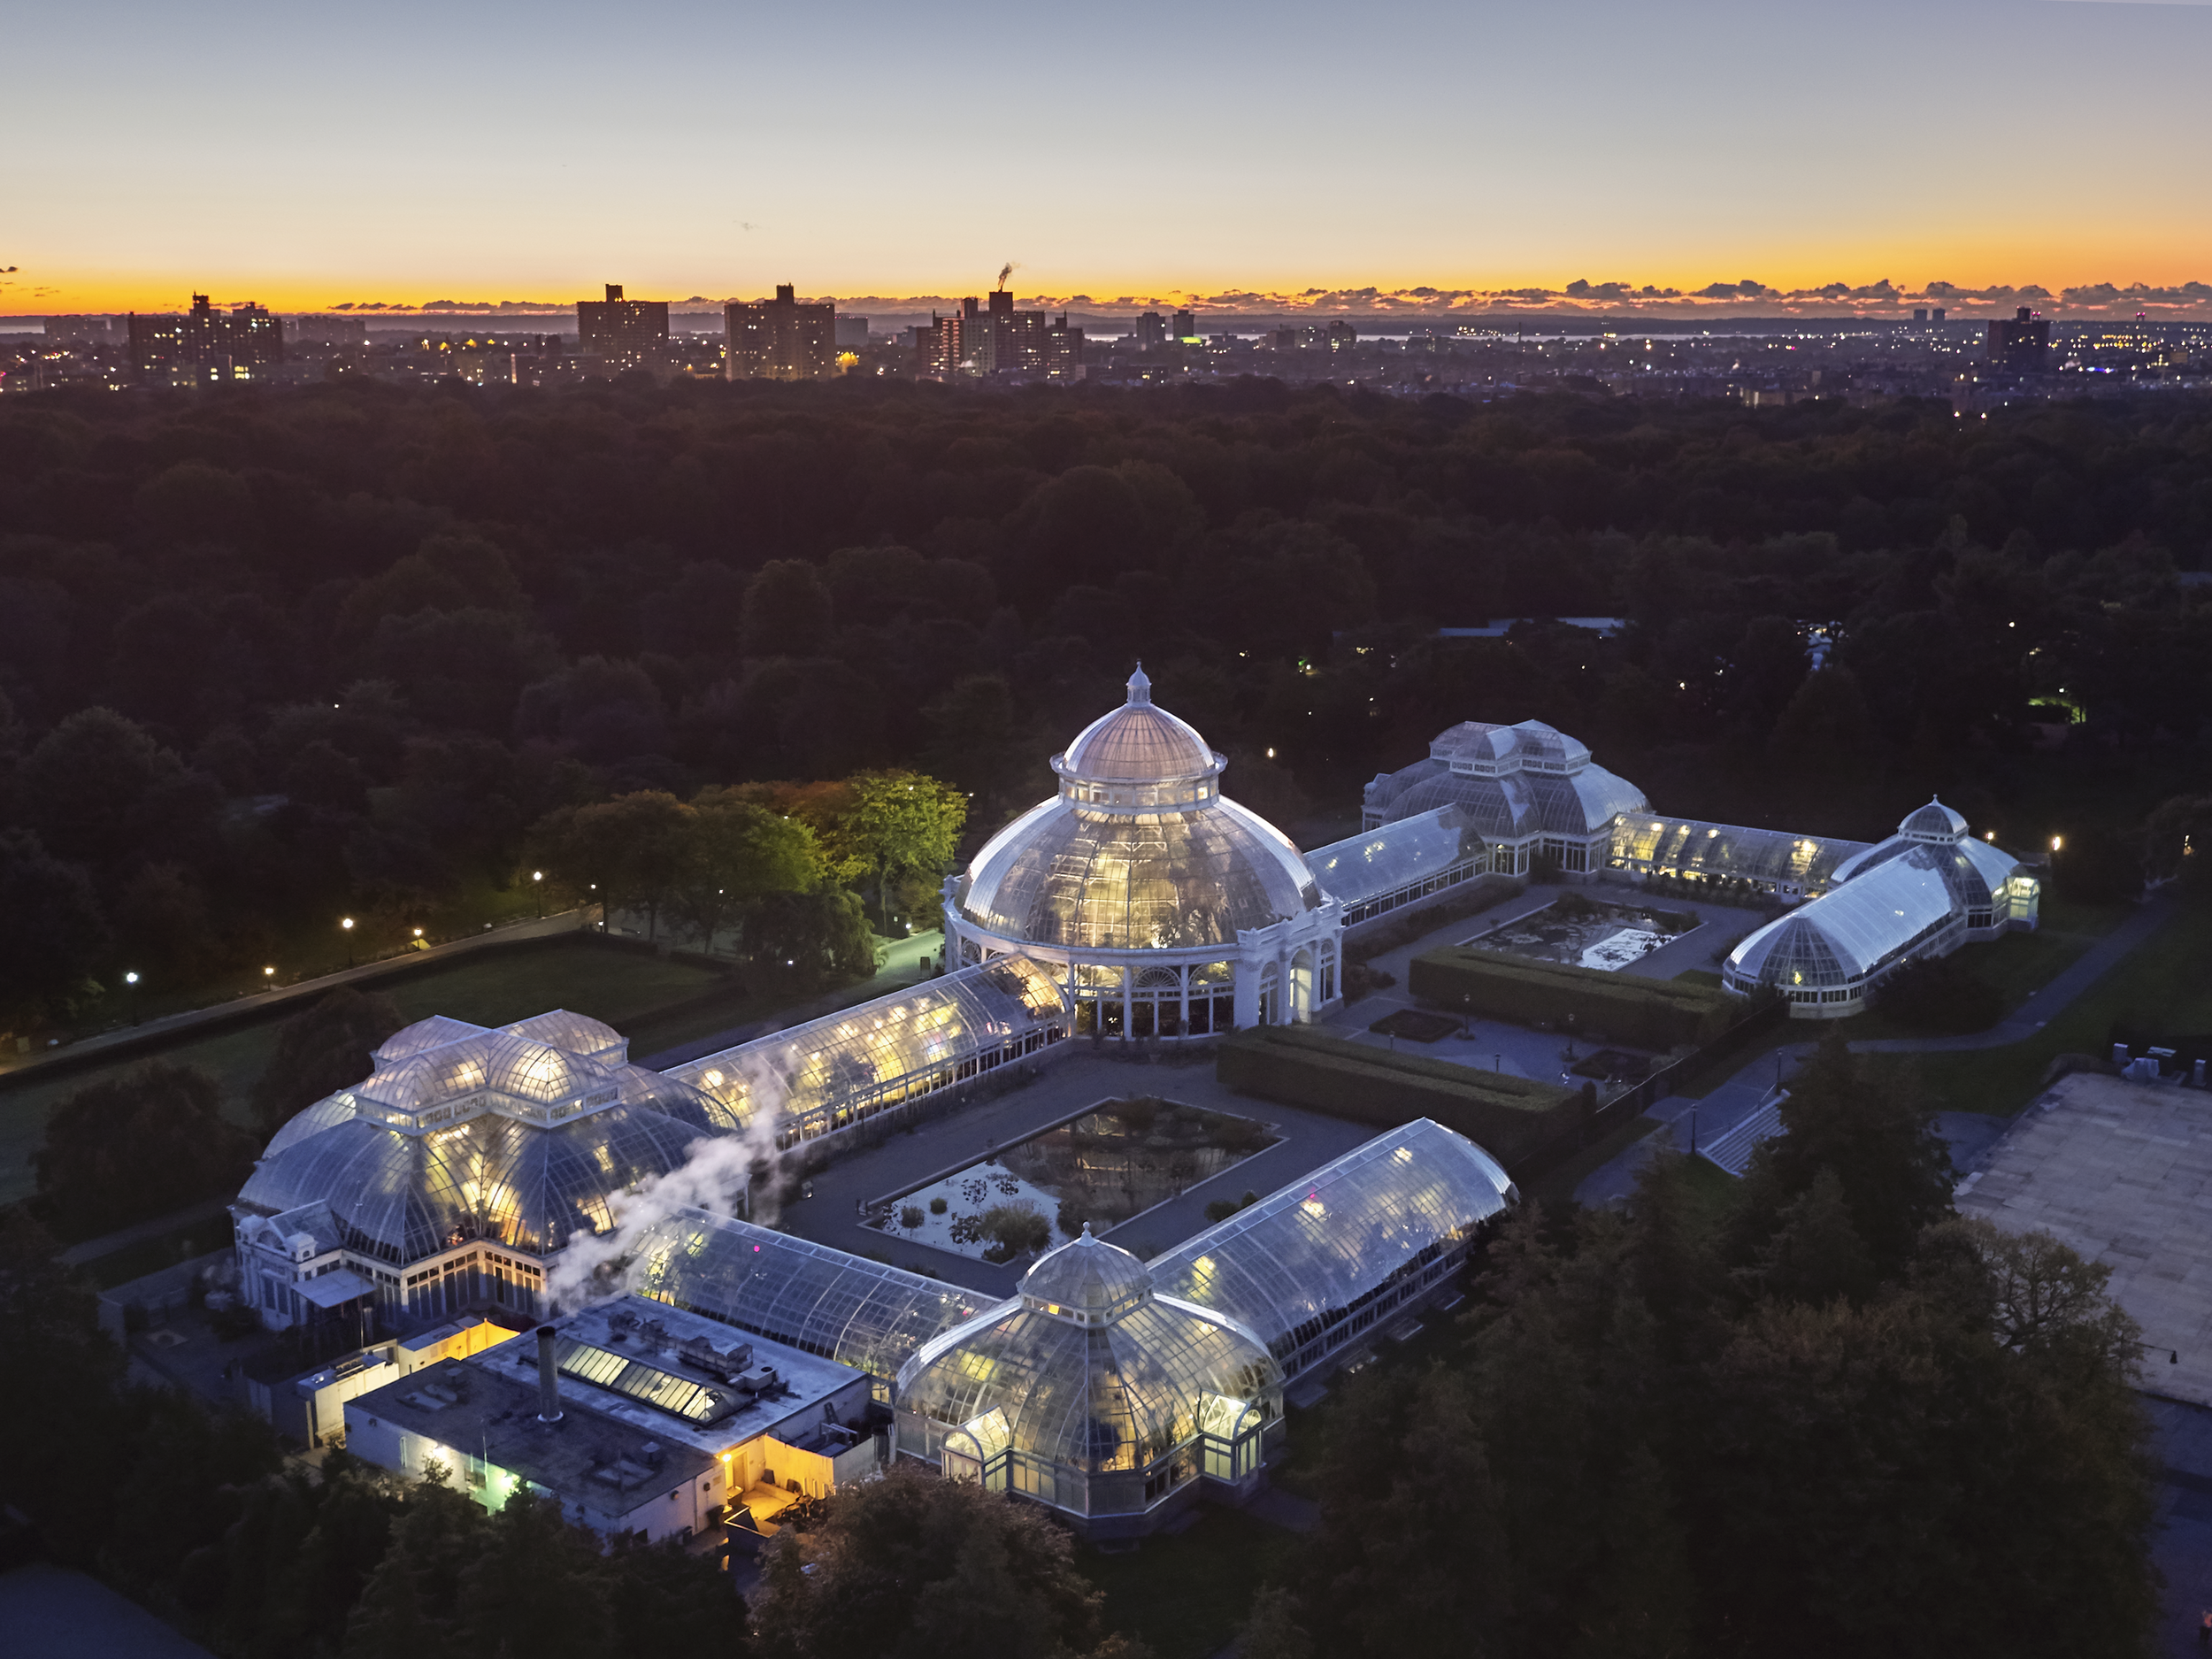 New York Botanical Gardens, The Bronx, New York City, New York